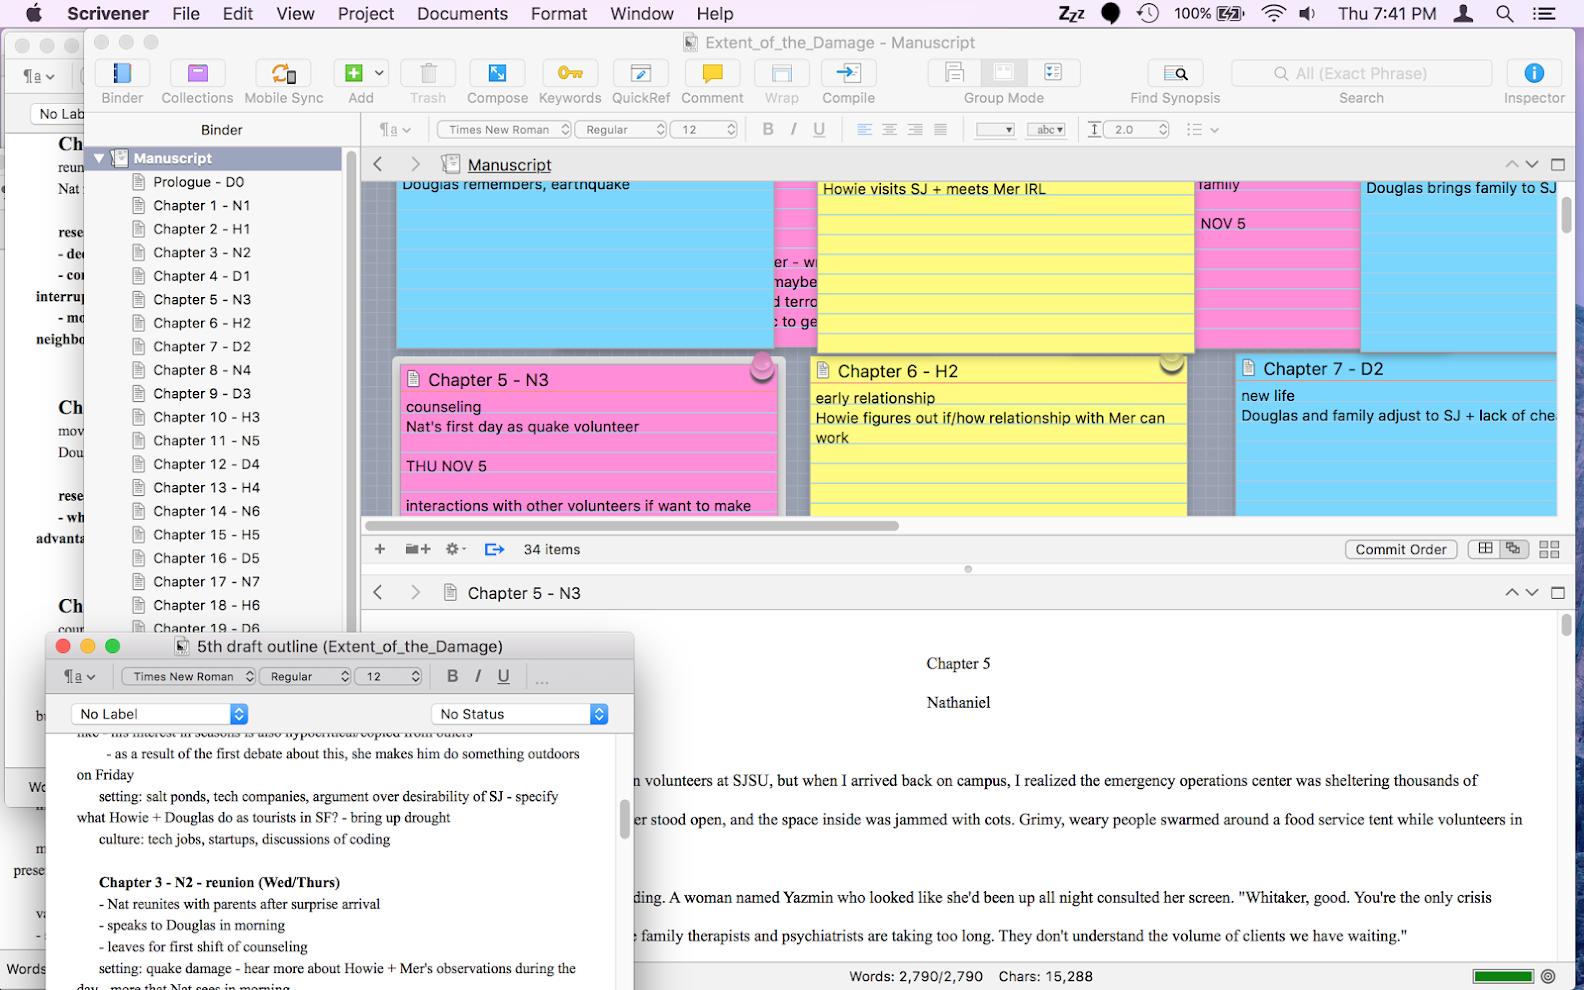 revision planning in Scrivener